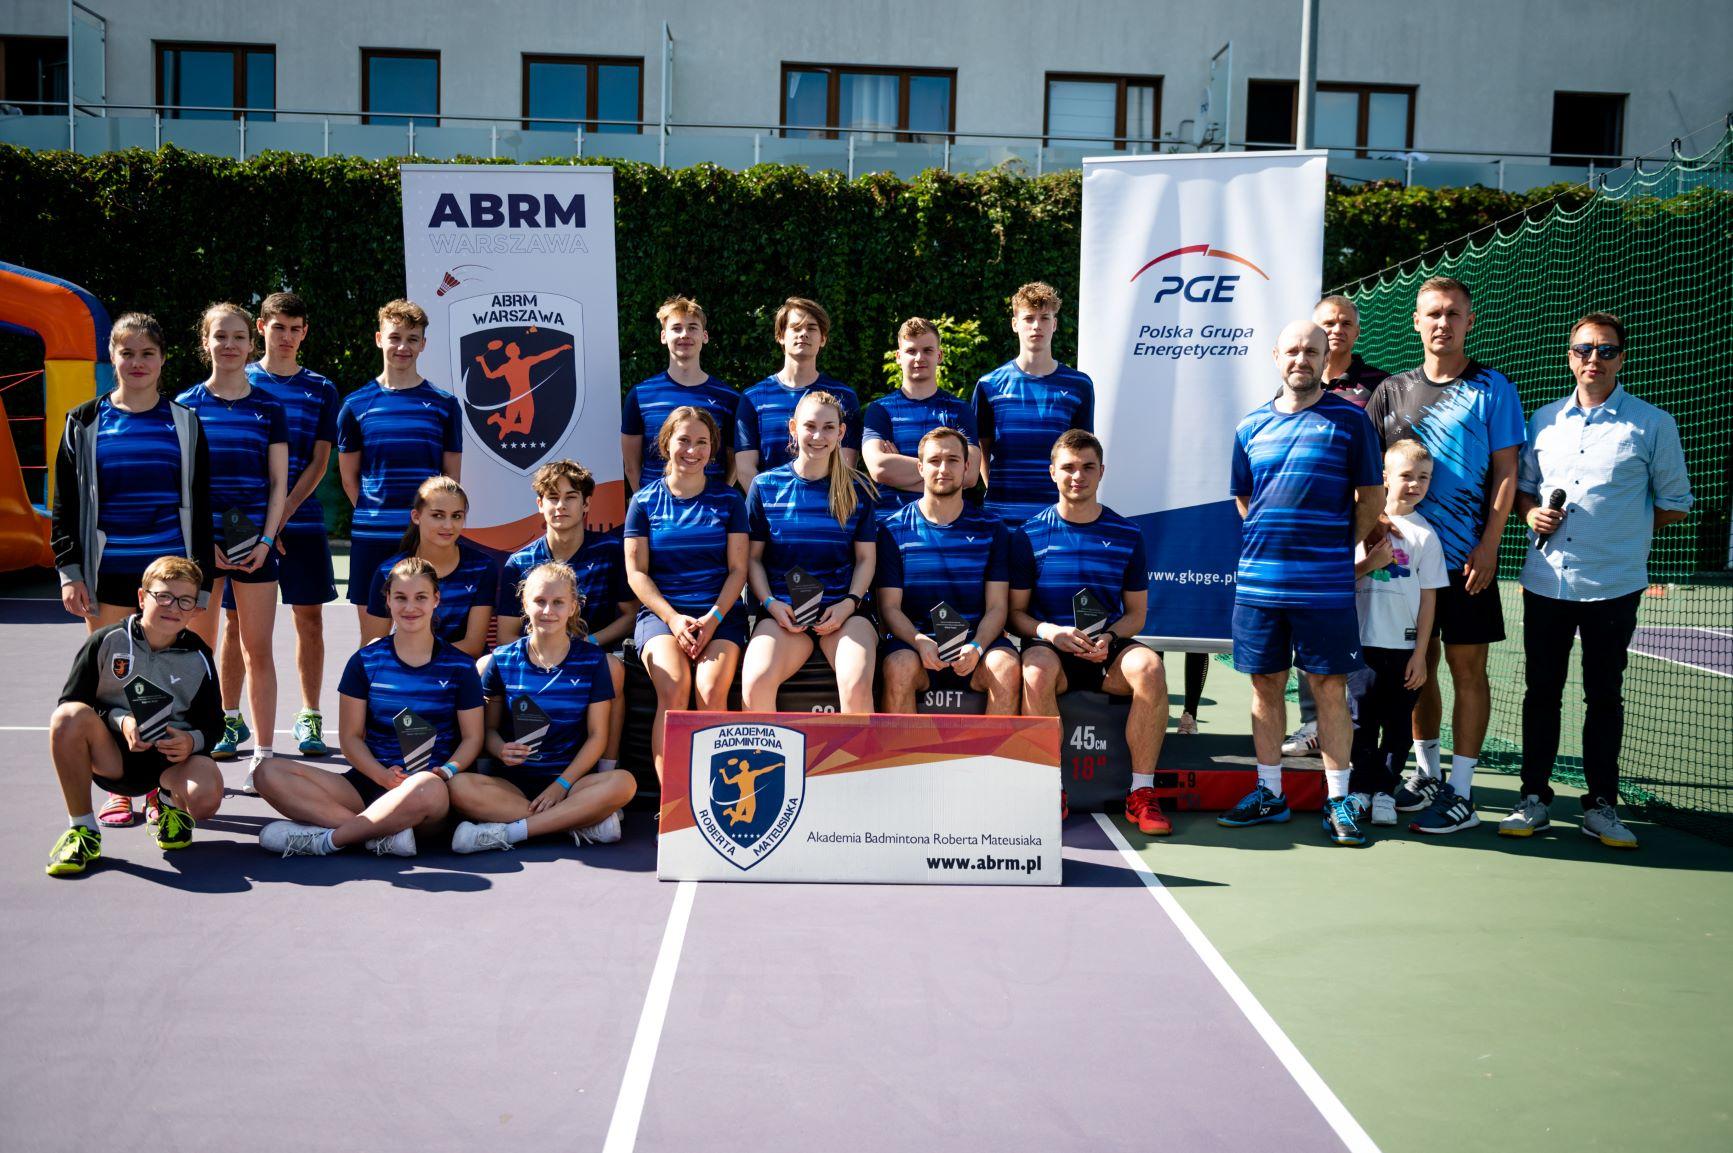 pge-daje-energie-akademii-badmintona-abrm-warszawa.jpg